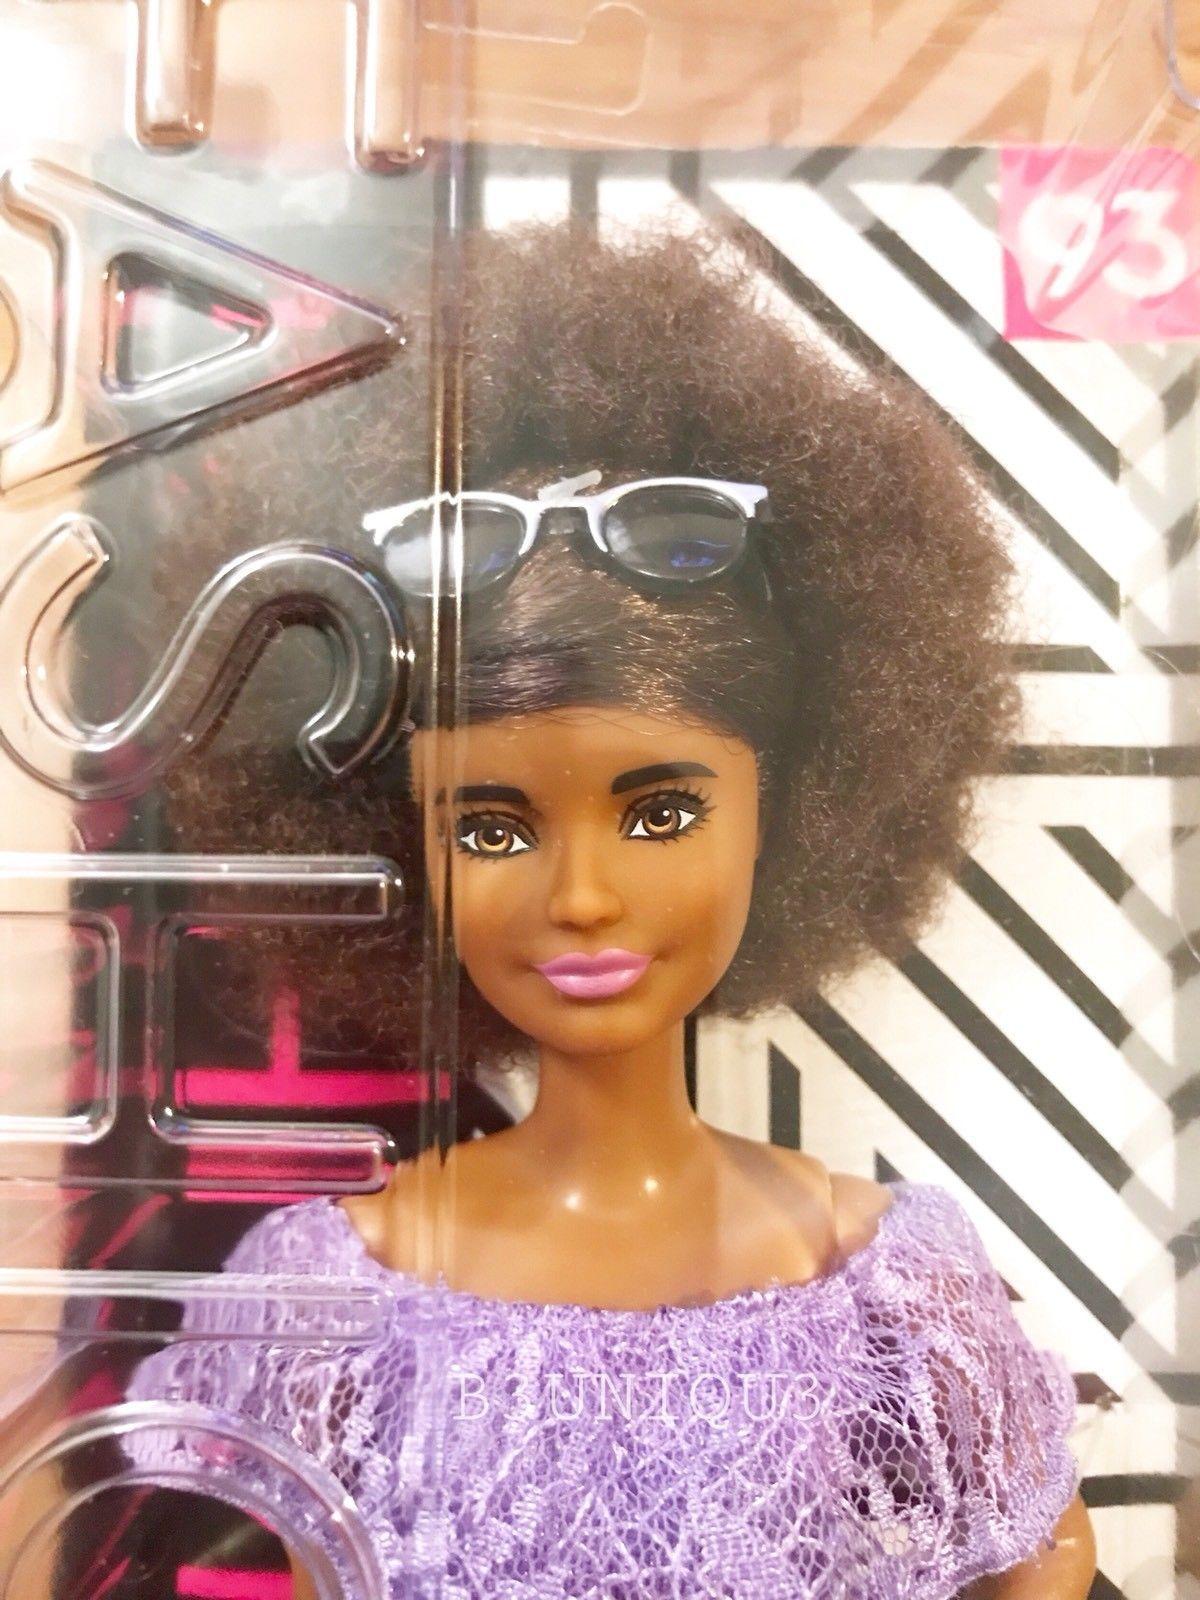 00bc1836126 Barbie Fashionista 93 Purple Lace Romper Petite African American Doll